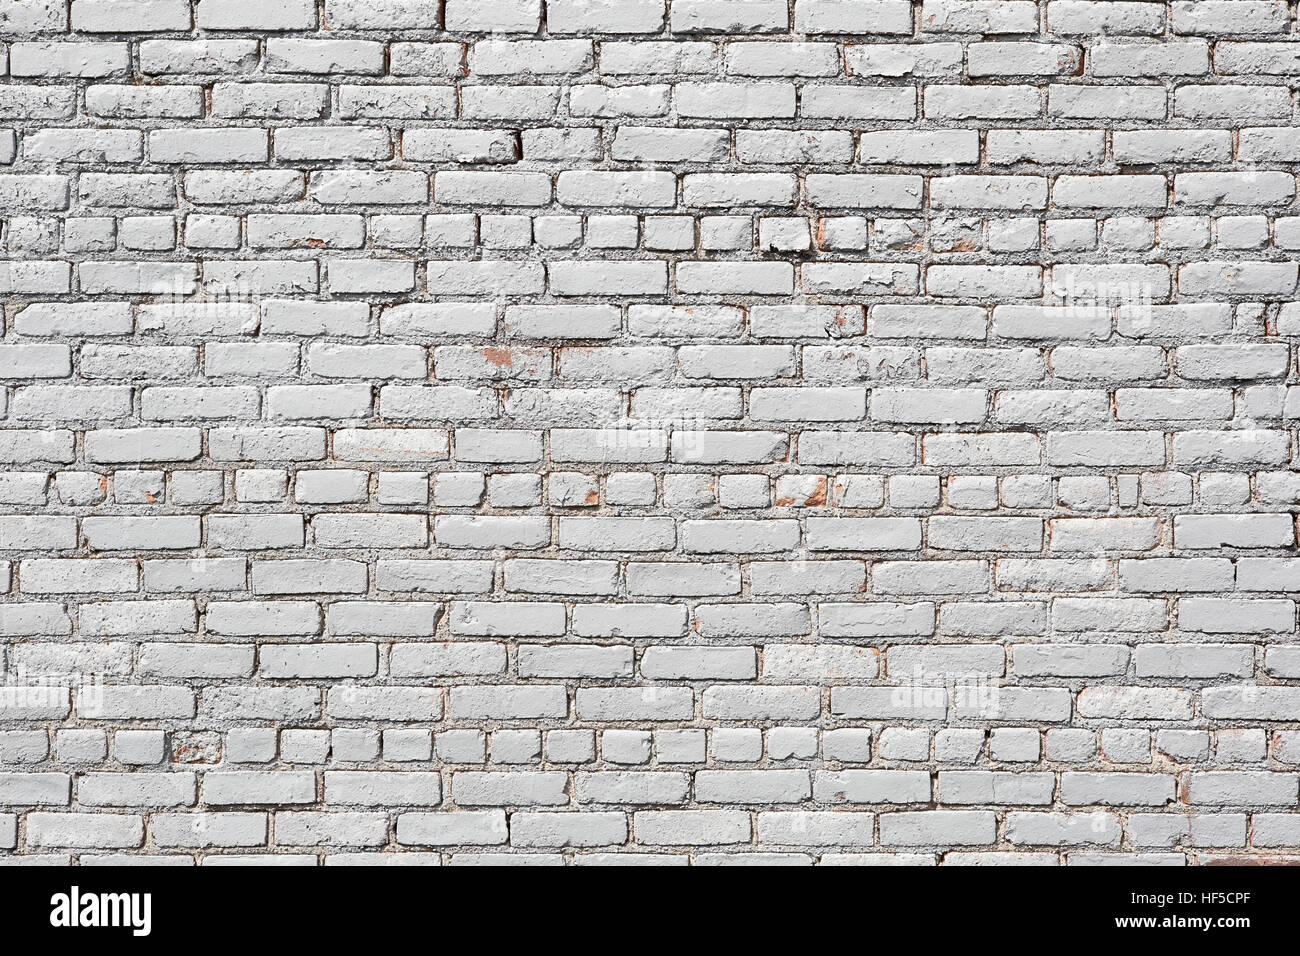 White Painted Brick Stock Photos Amp White Painted Brick